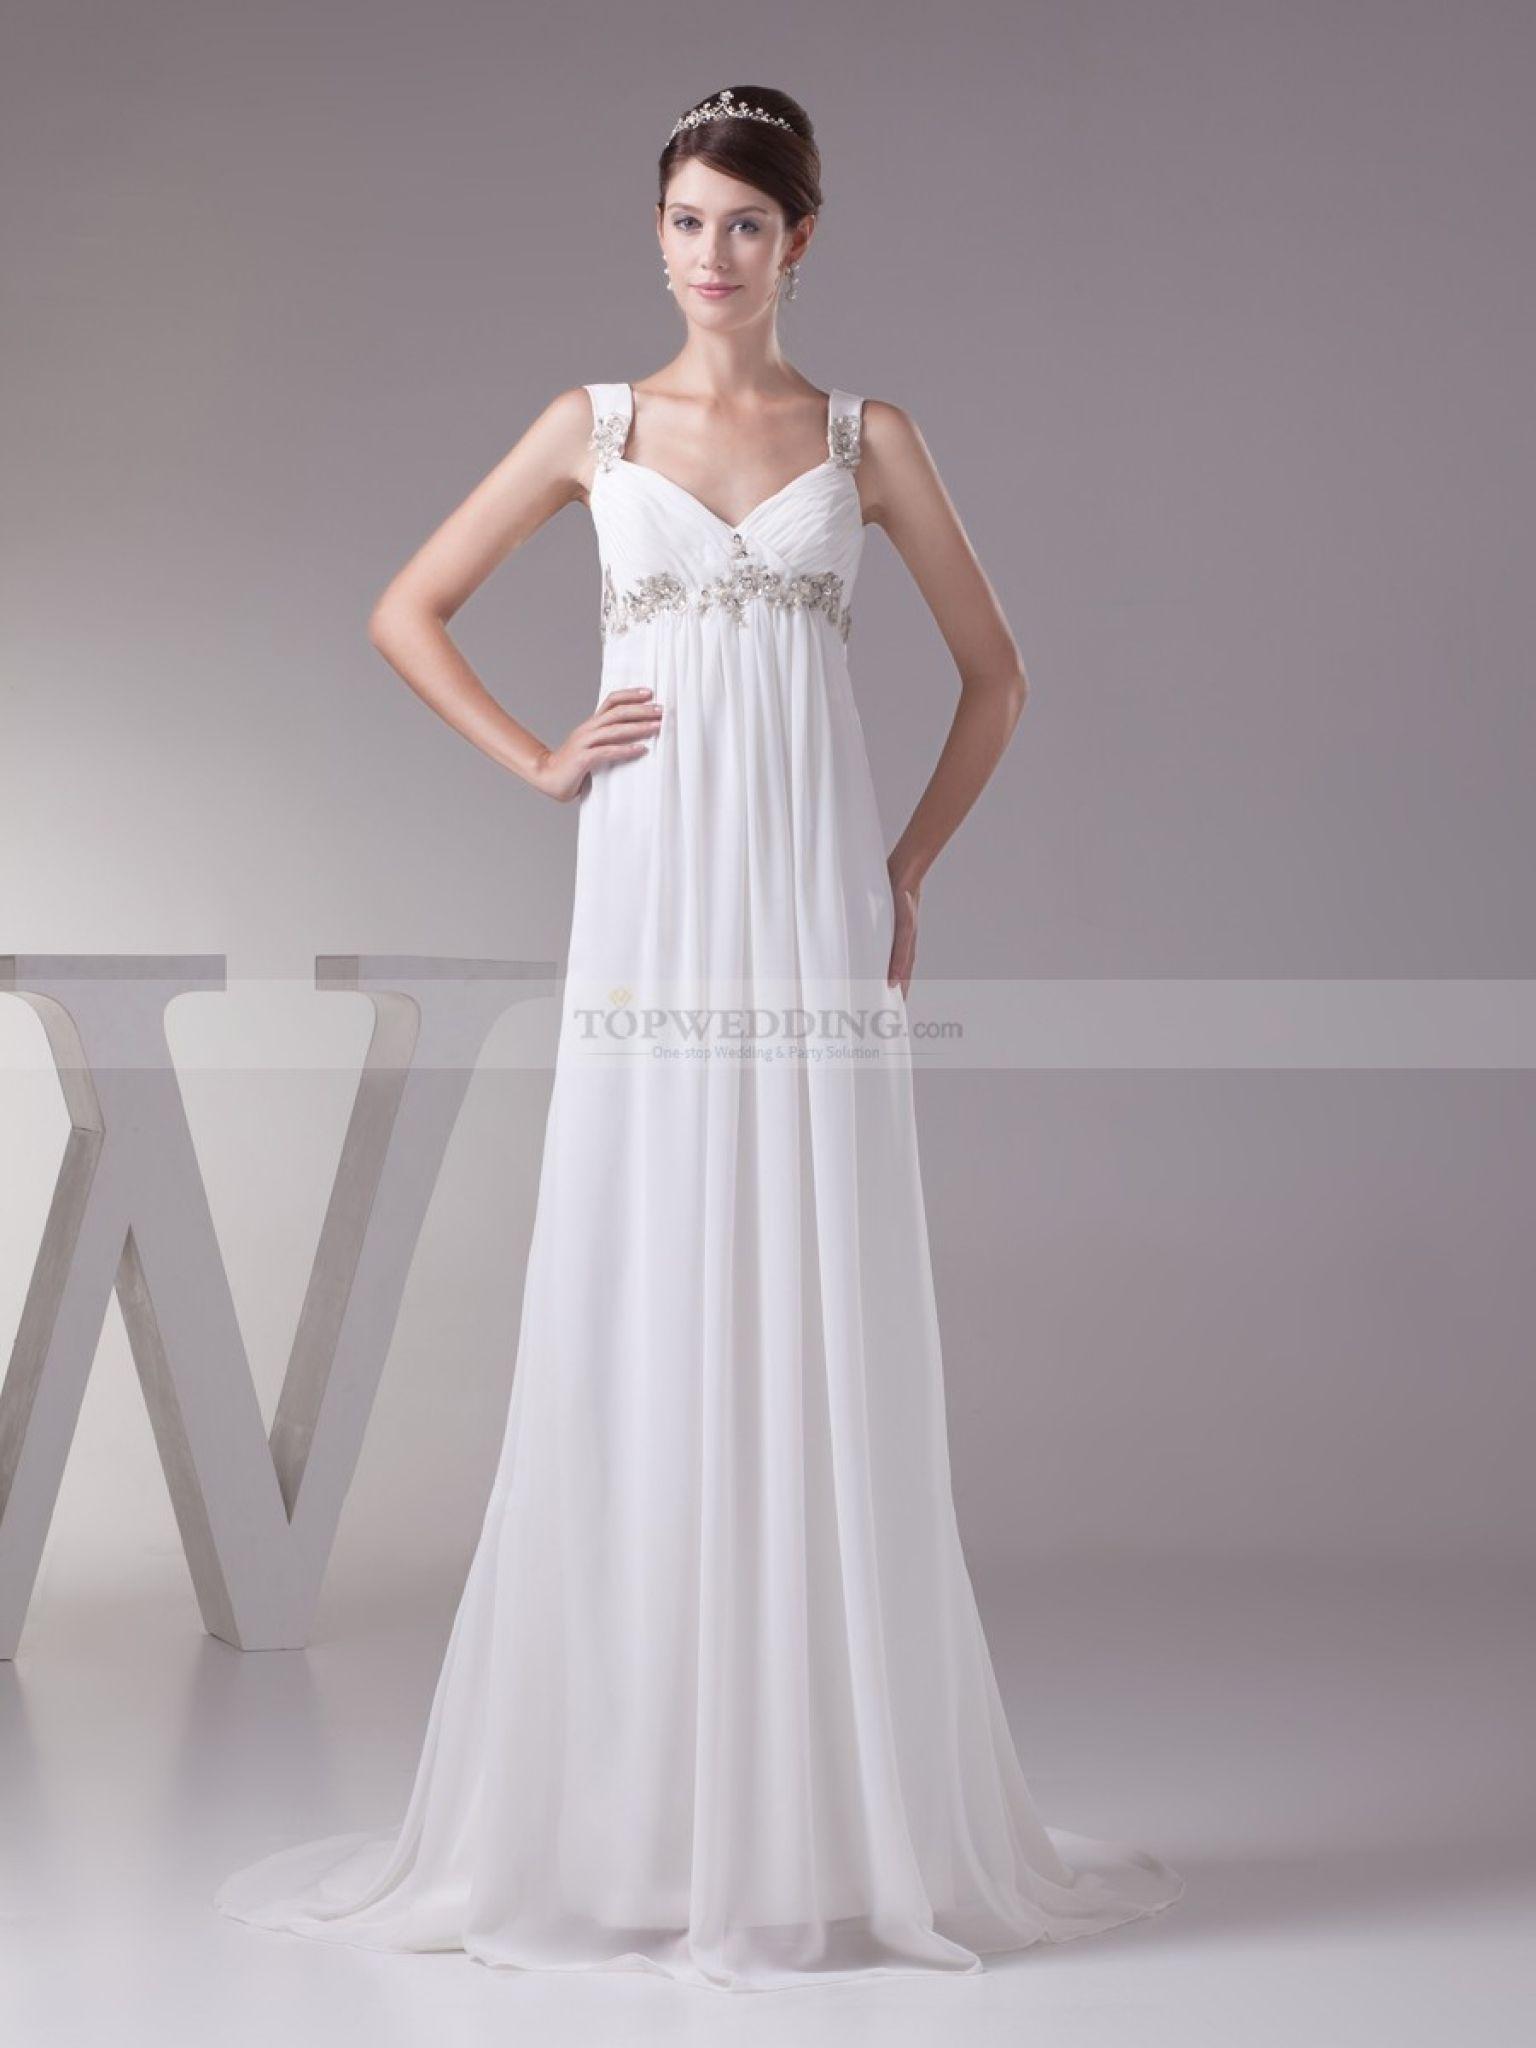 Vintage Wedding Dresses Chicago   Cold Shoulder Dresses For Wedding Check  More At Http:/ Nice Ideas